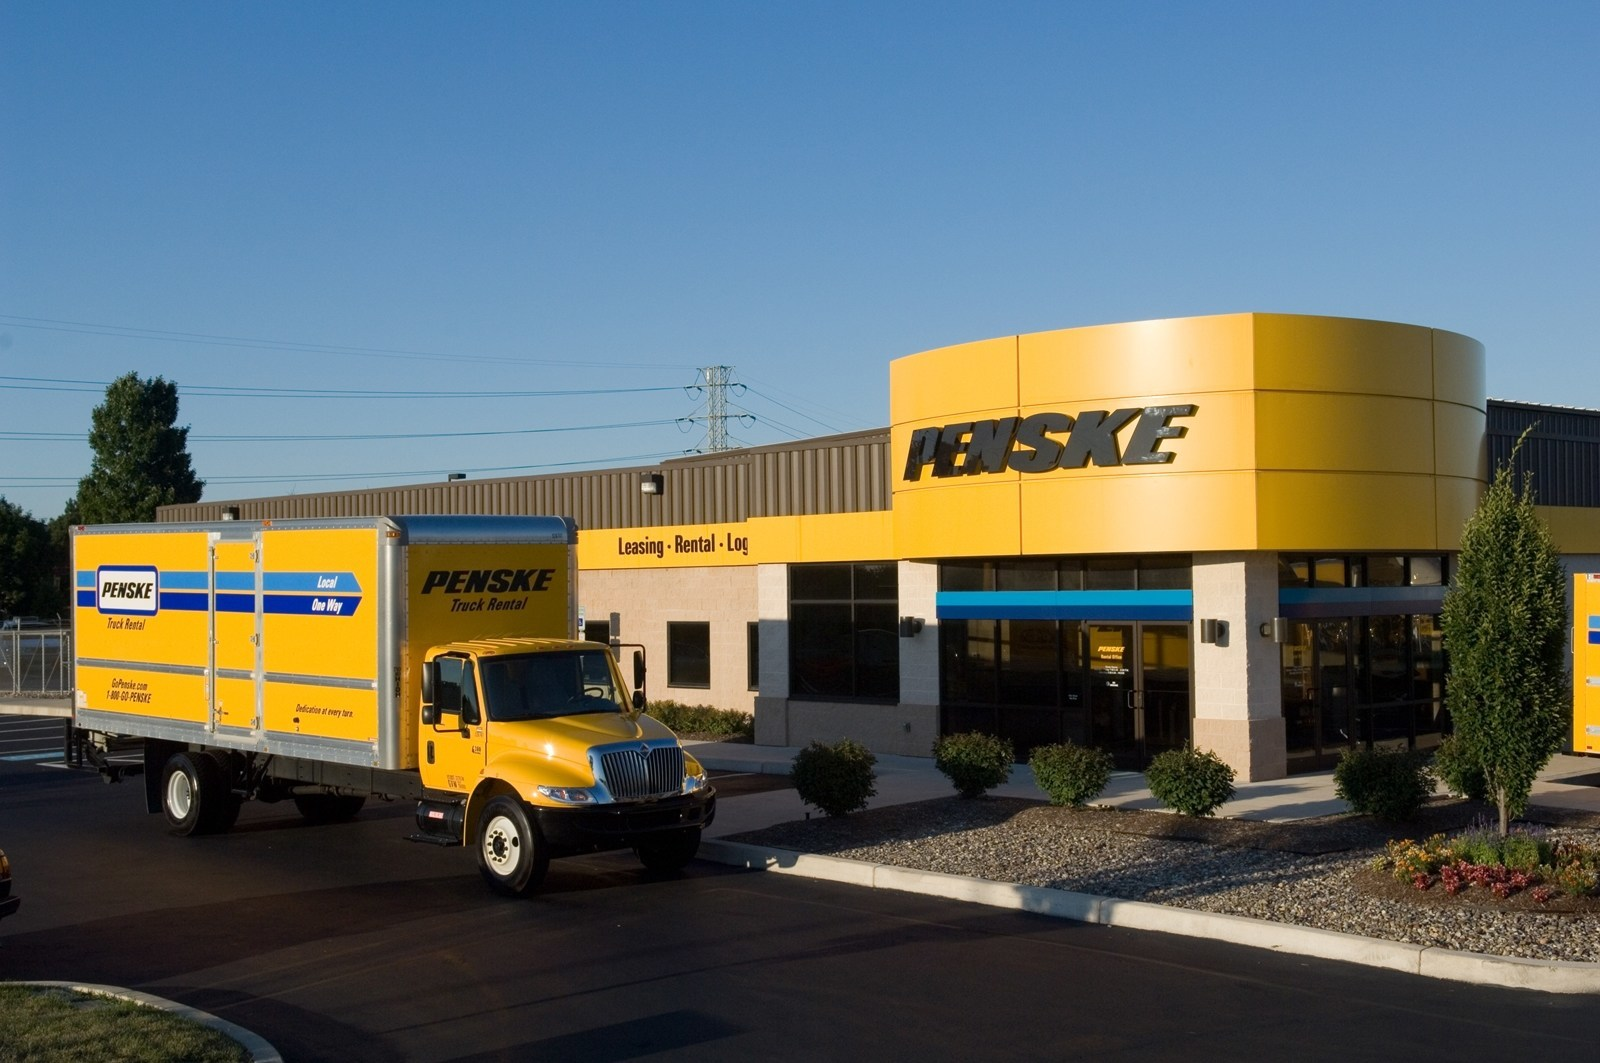 Penske trailer rental coupons